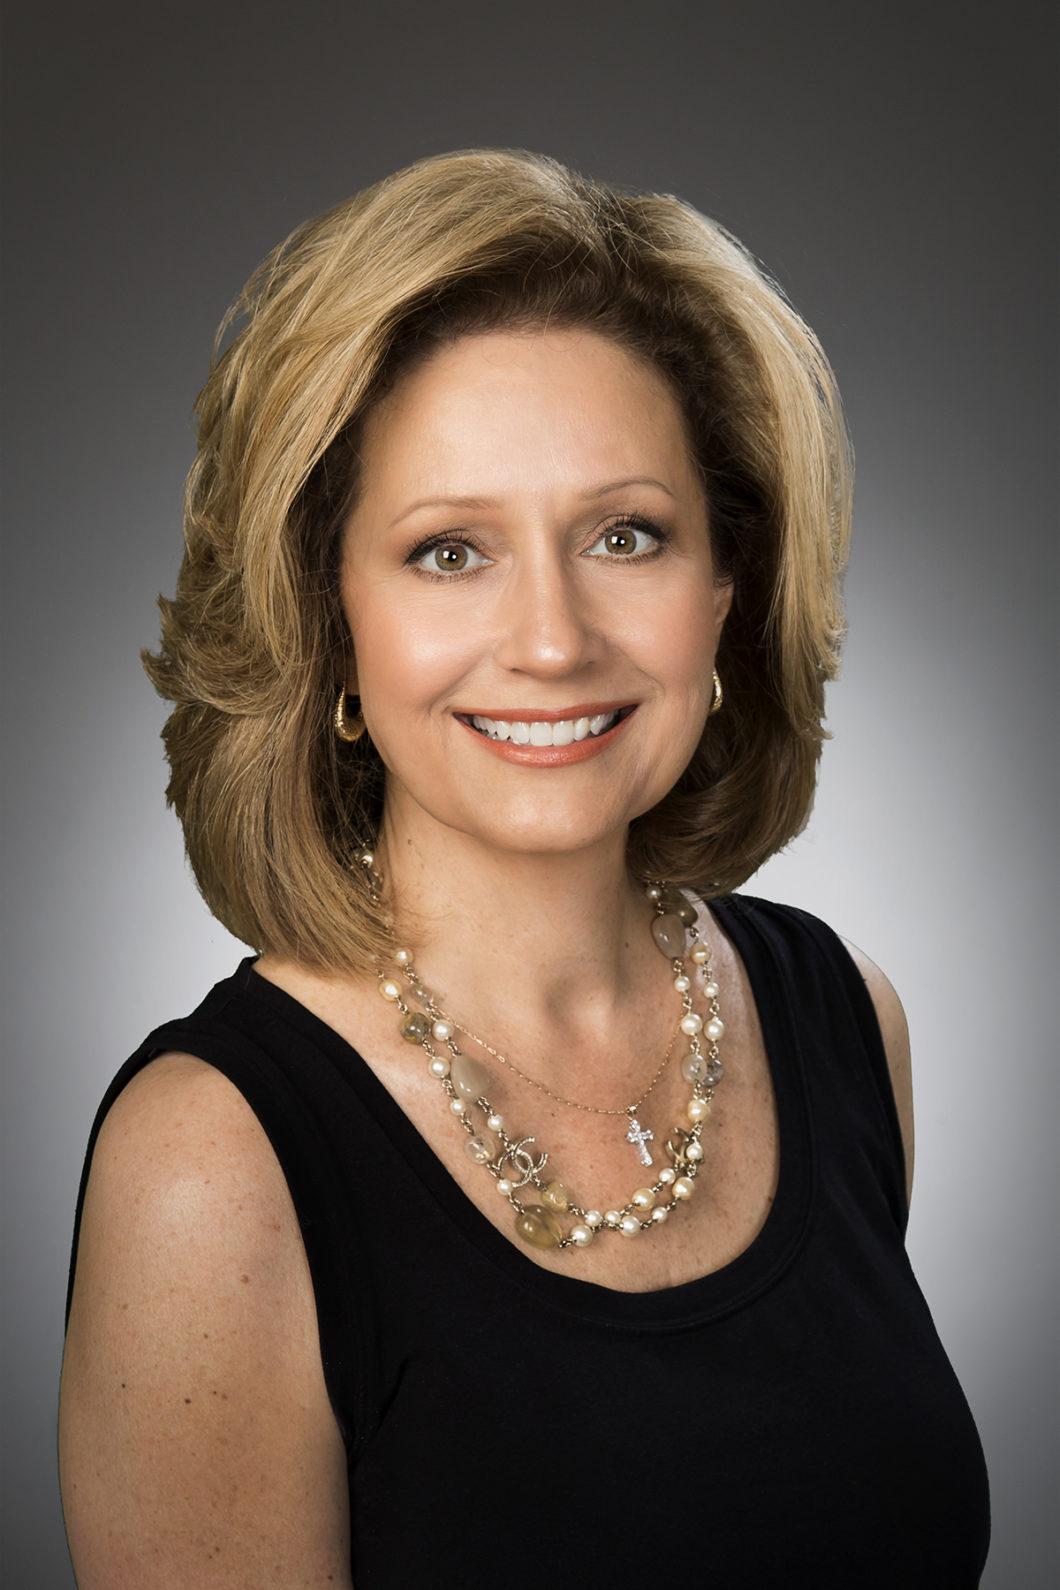 Linda Thompson, Agent, The Norton Agency - Sheila Davis Group